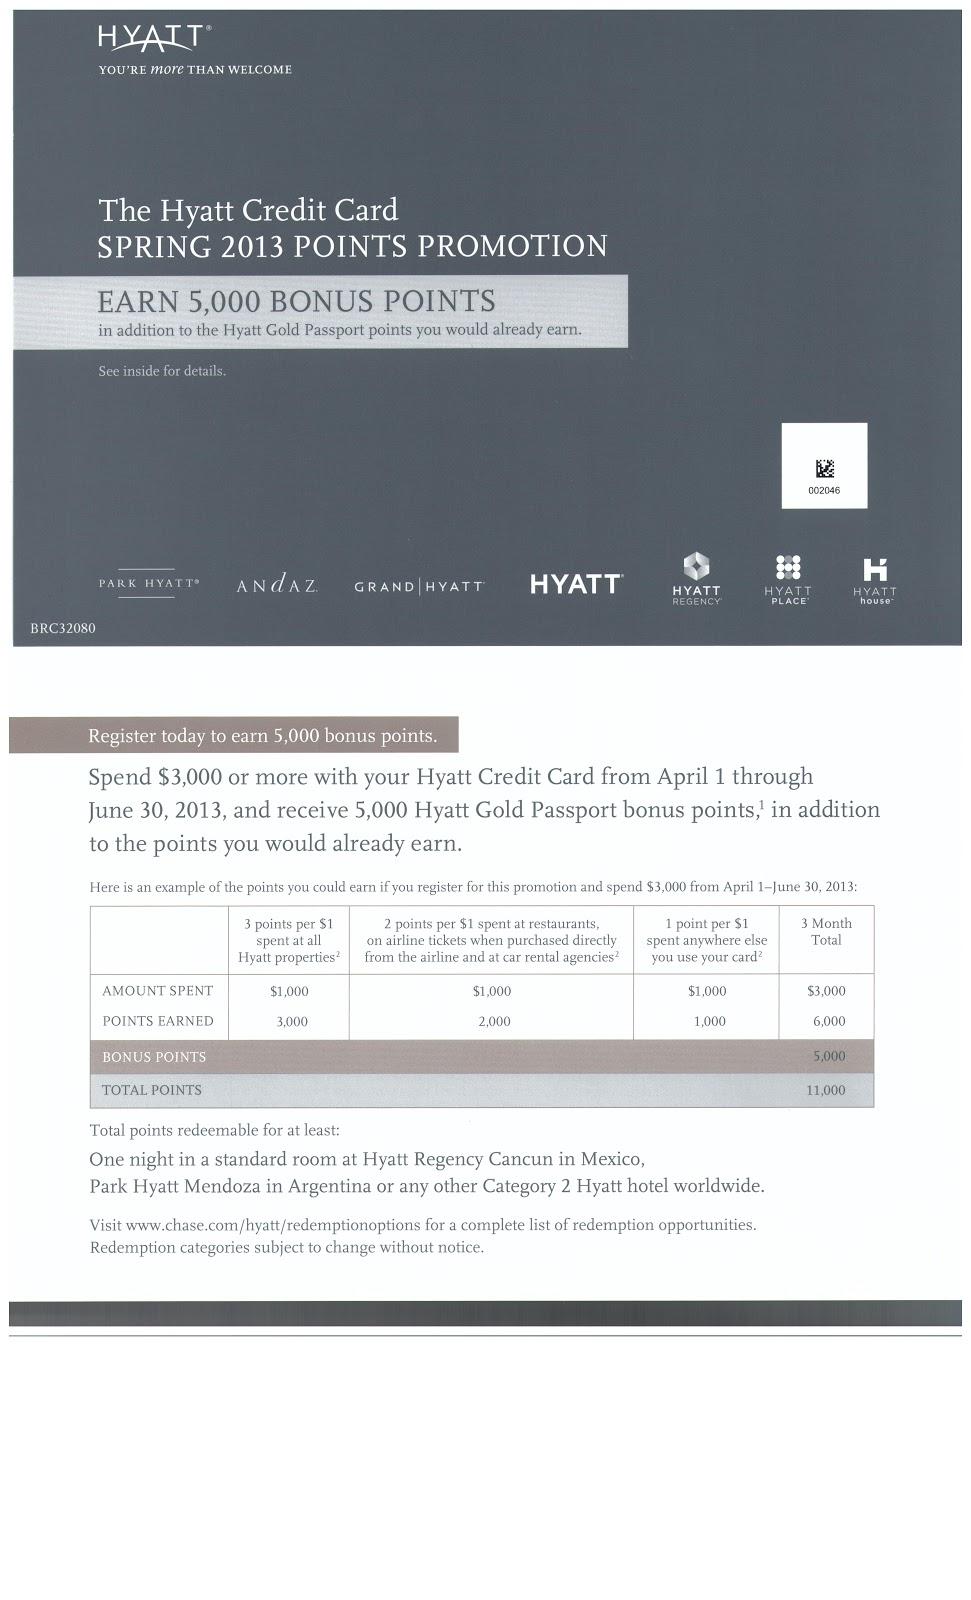 Check Your Mail: 5,000 Hyatt GoldPoint Offer